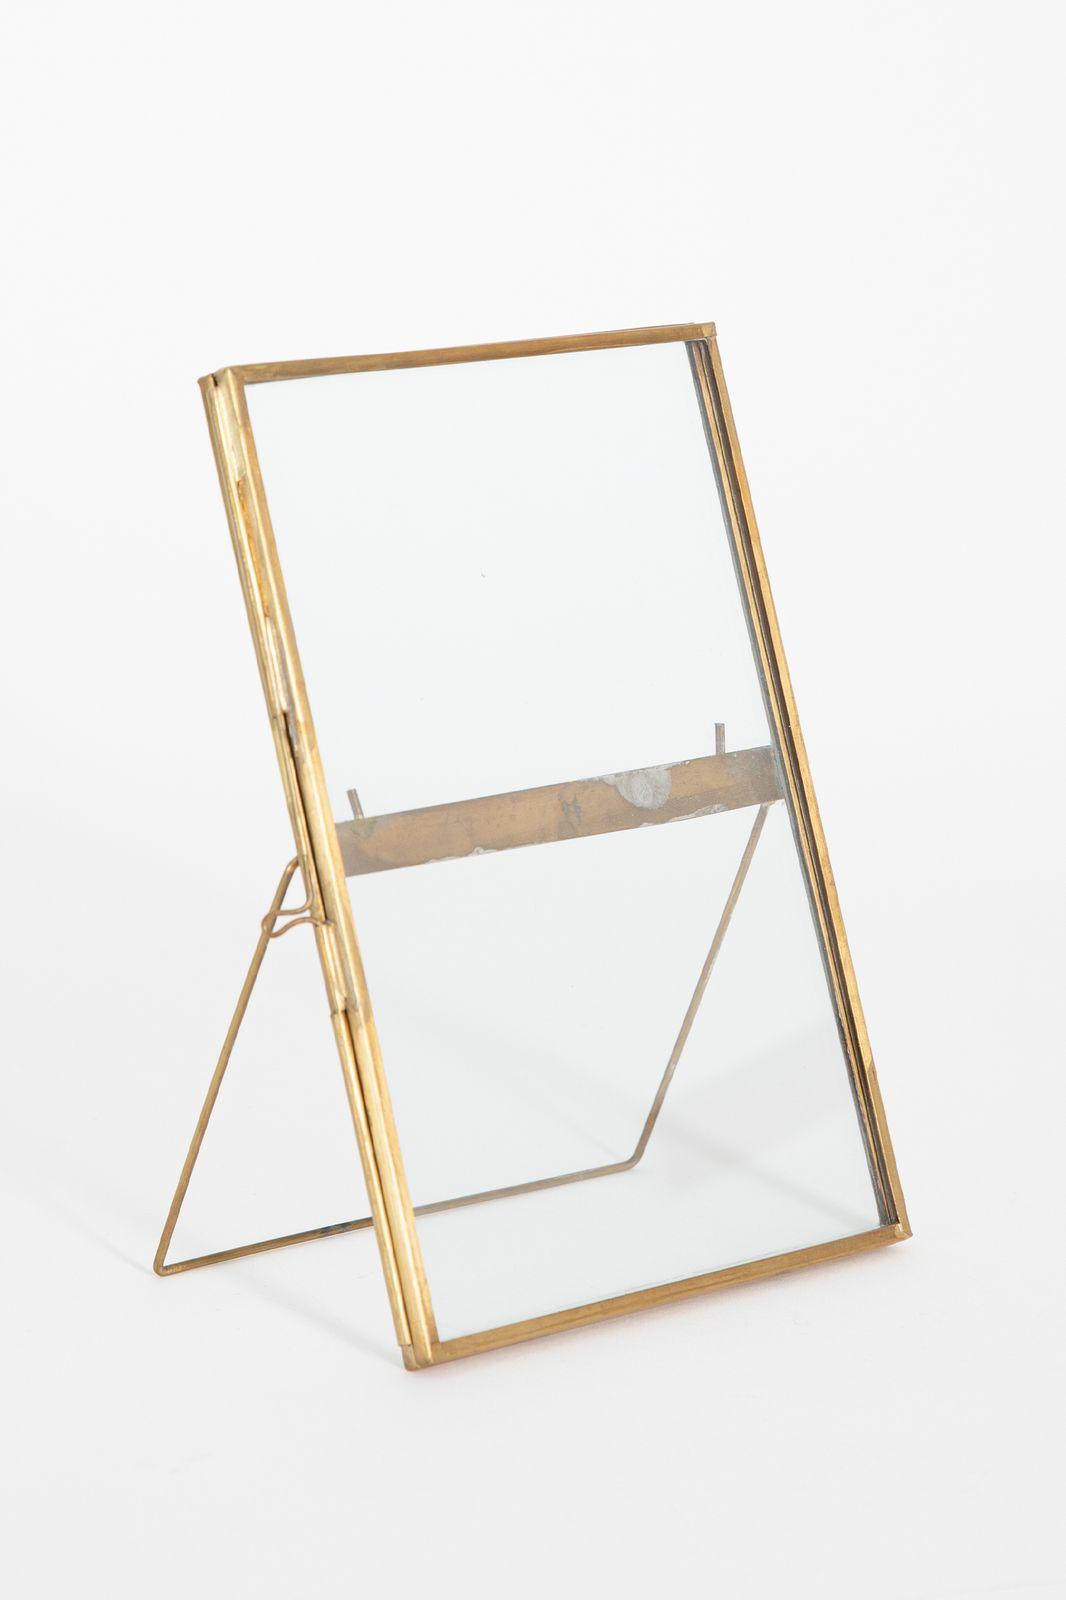 Fotolijst dubbelglas staand (18x13,5 cm)